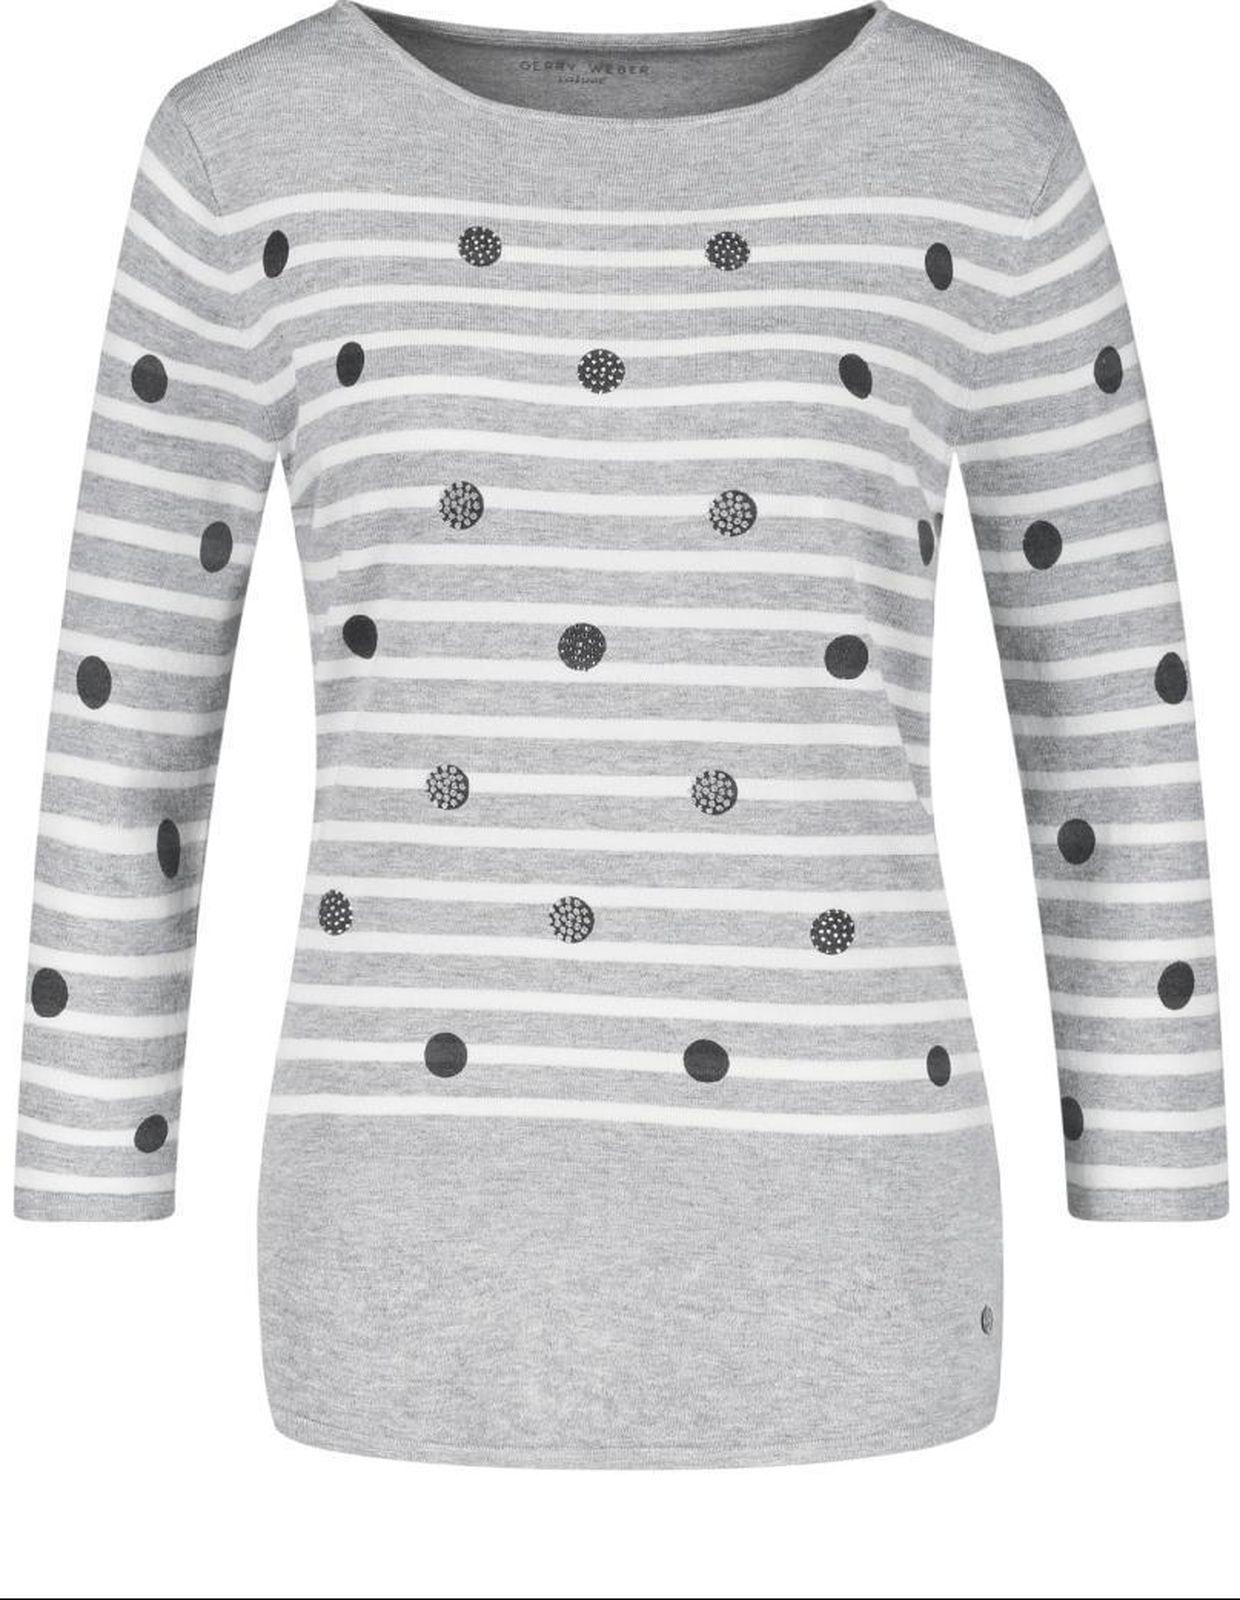 Пуловер женский Gerry Weber Casual, цвет: серый. 2 191-97 477-44702_02092. Размер 38 (44)2 191-97 477-44702_02092